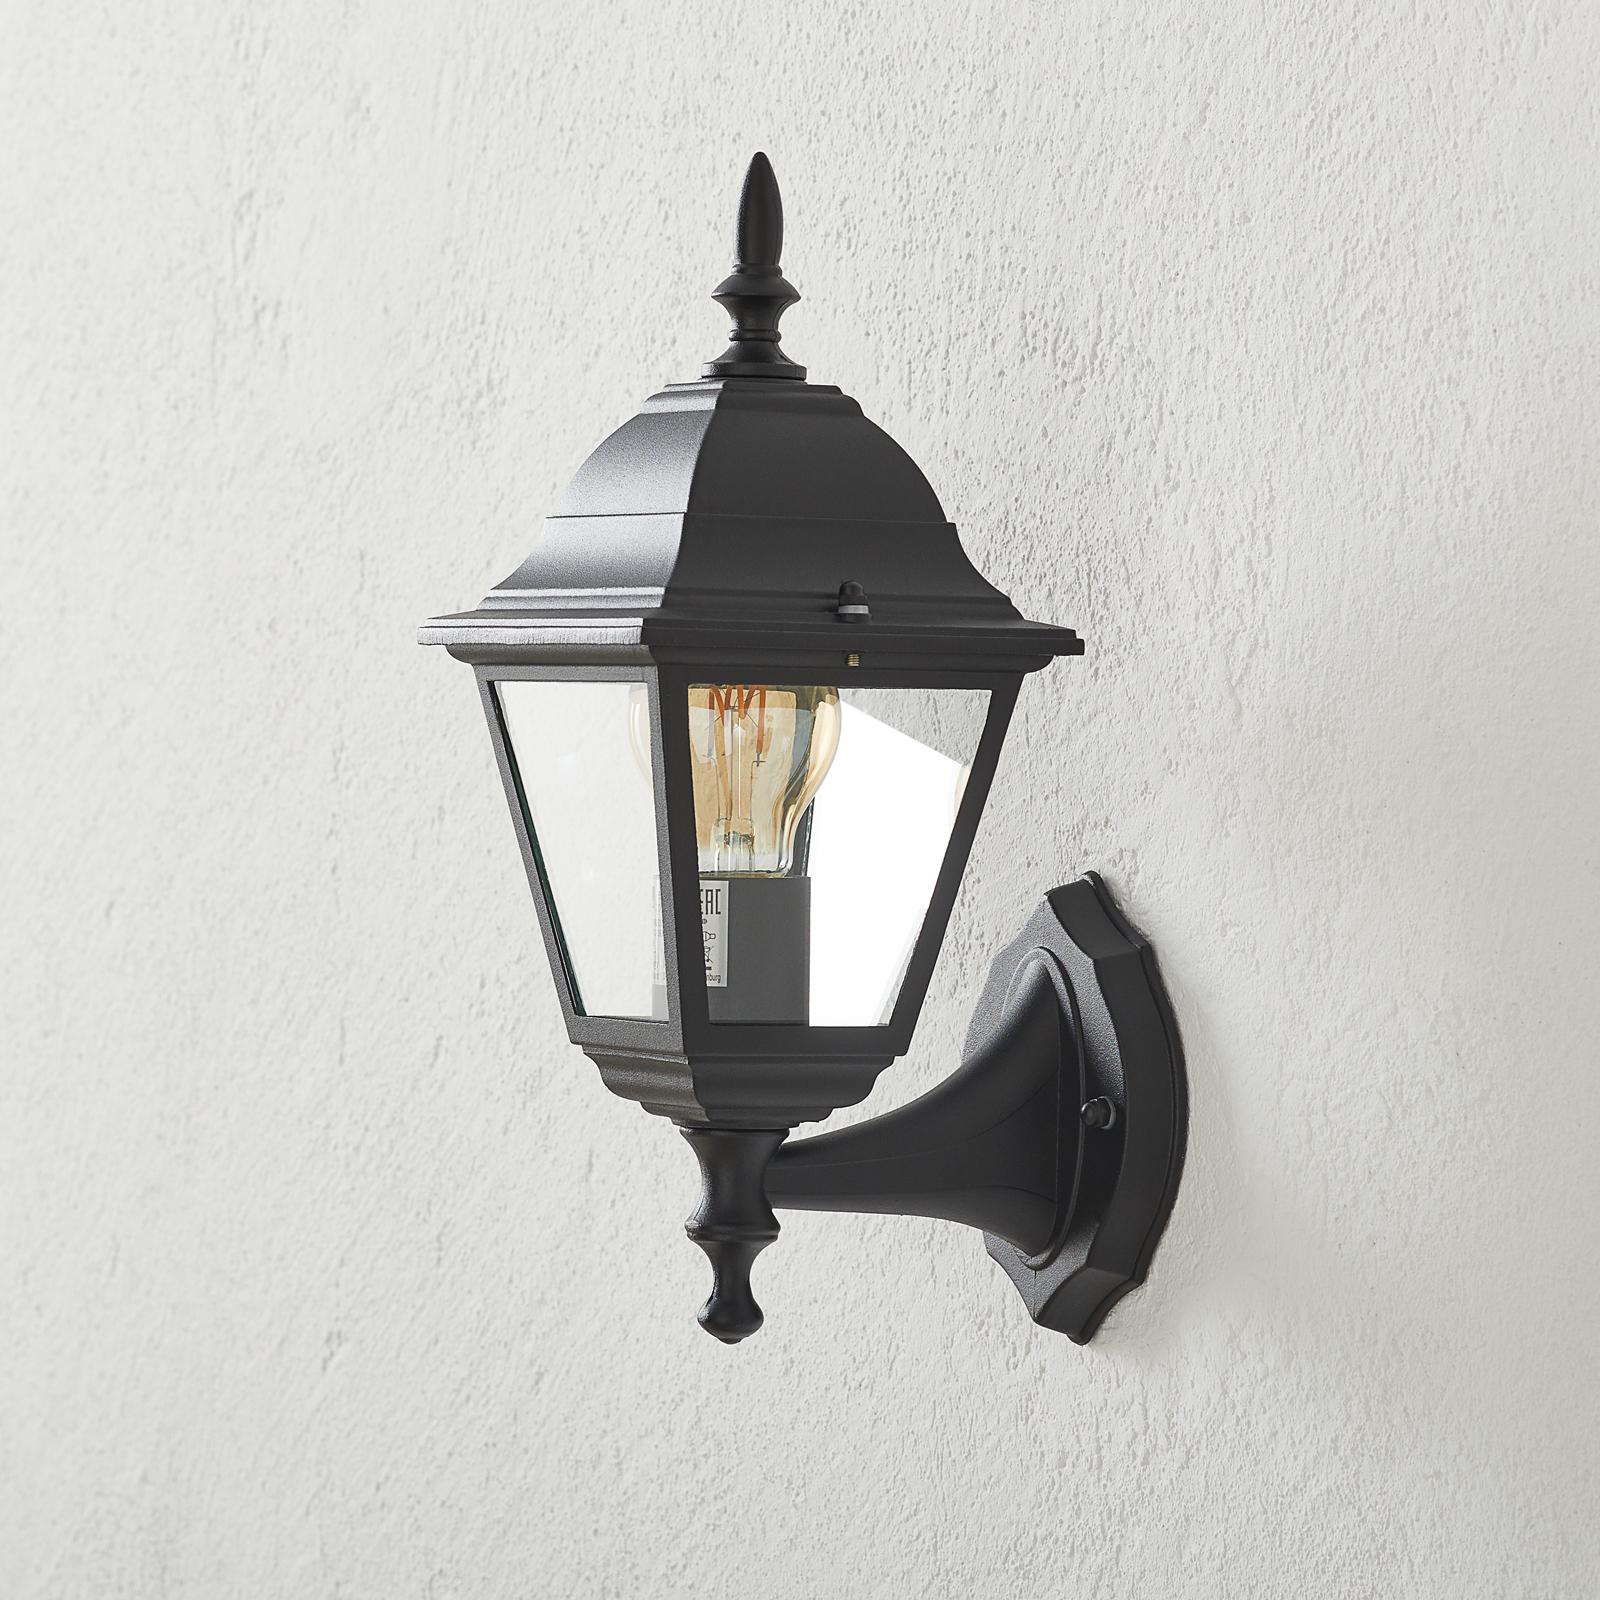 Special outdoor wall light Newport I_1507089_1